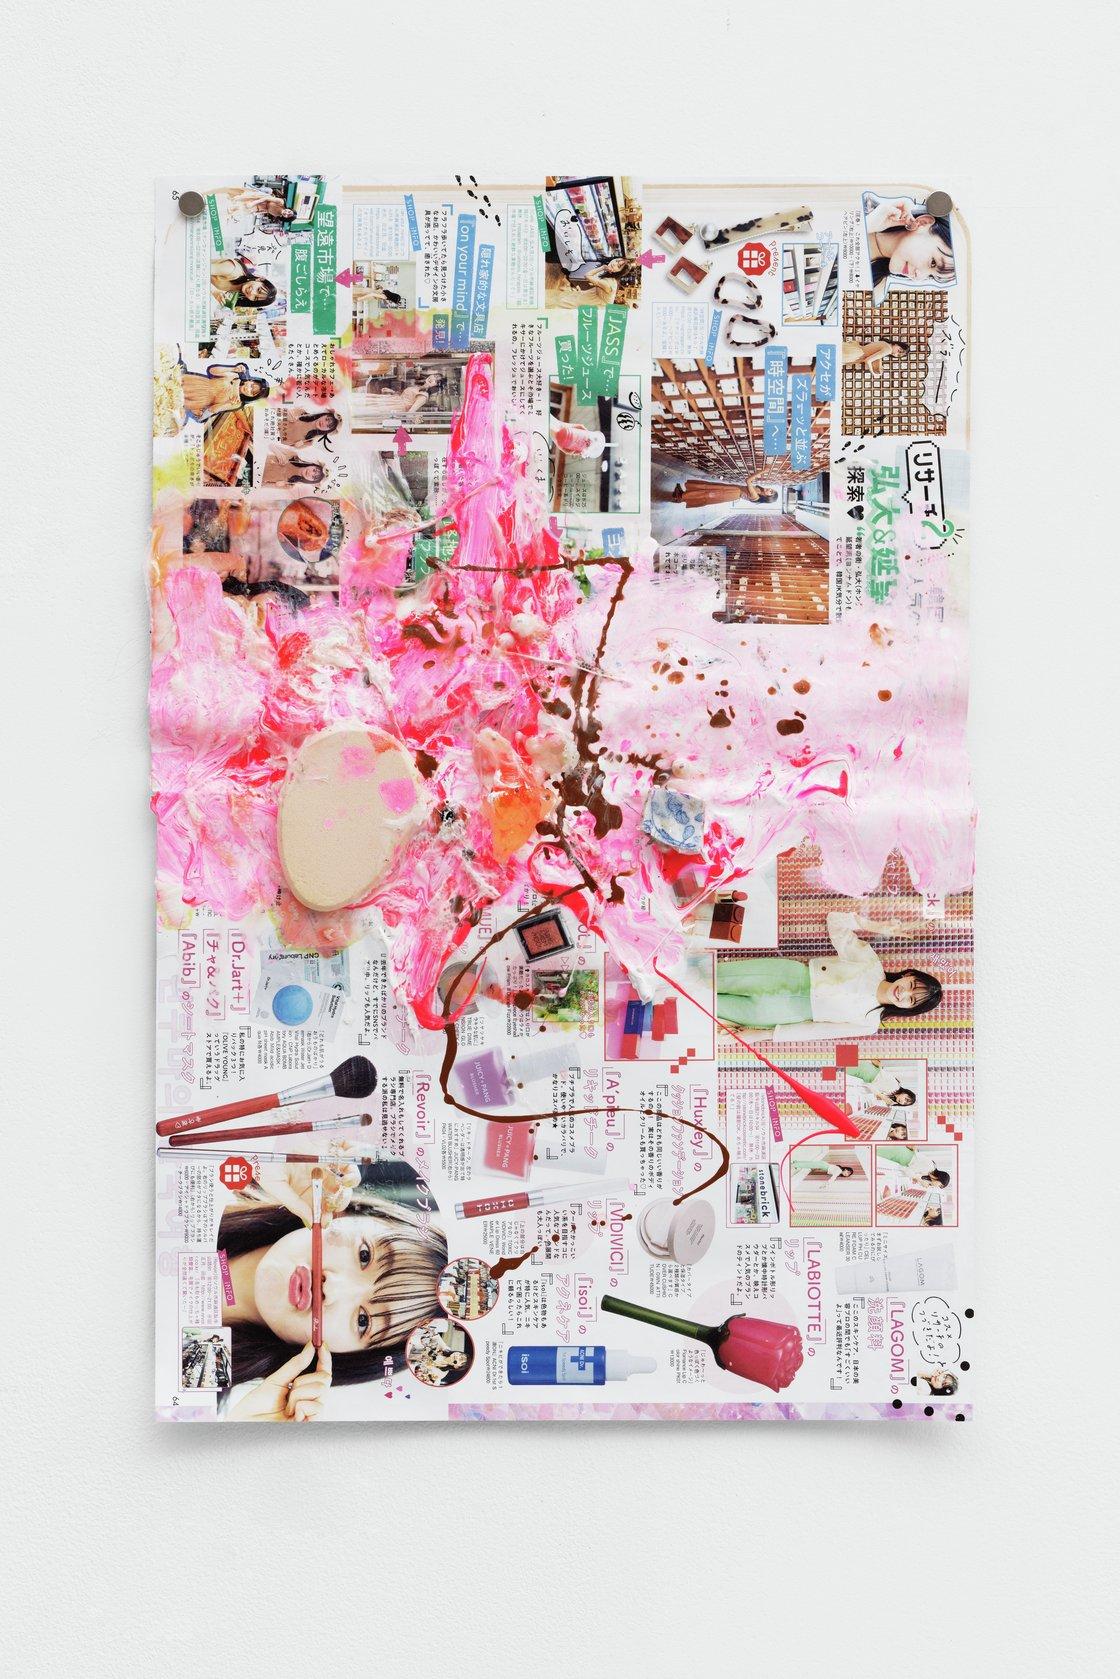 Mimosa Echard, Powder Room, 2019